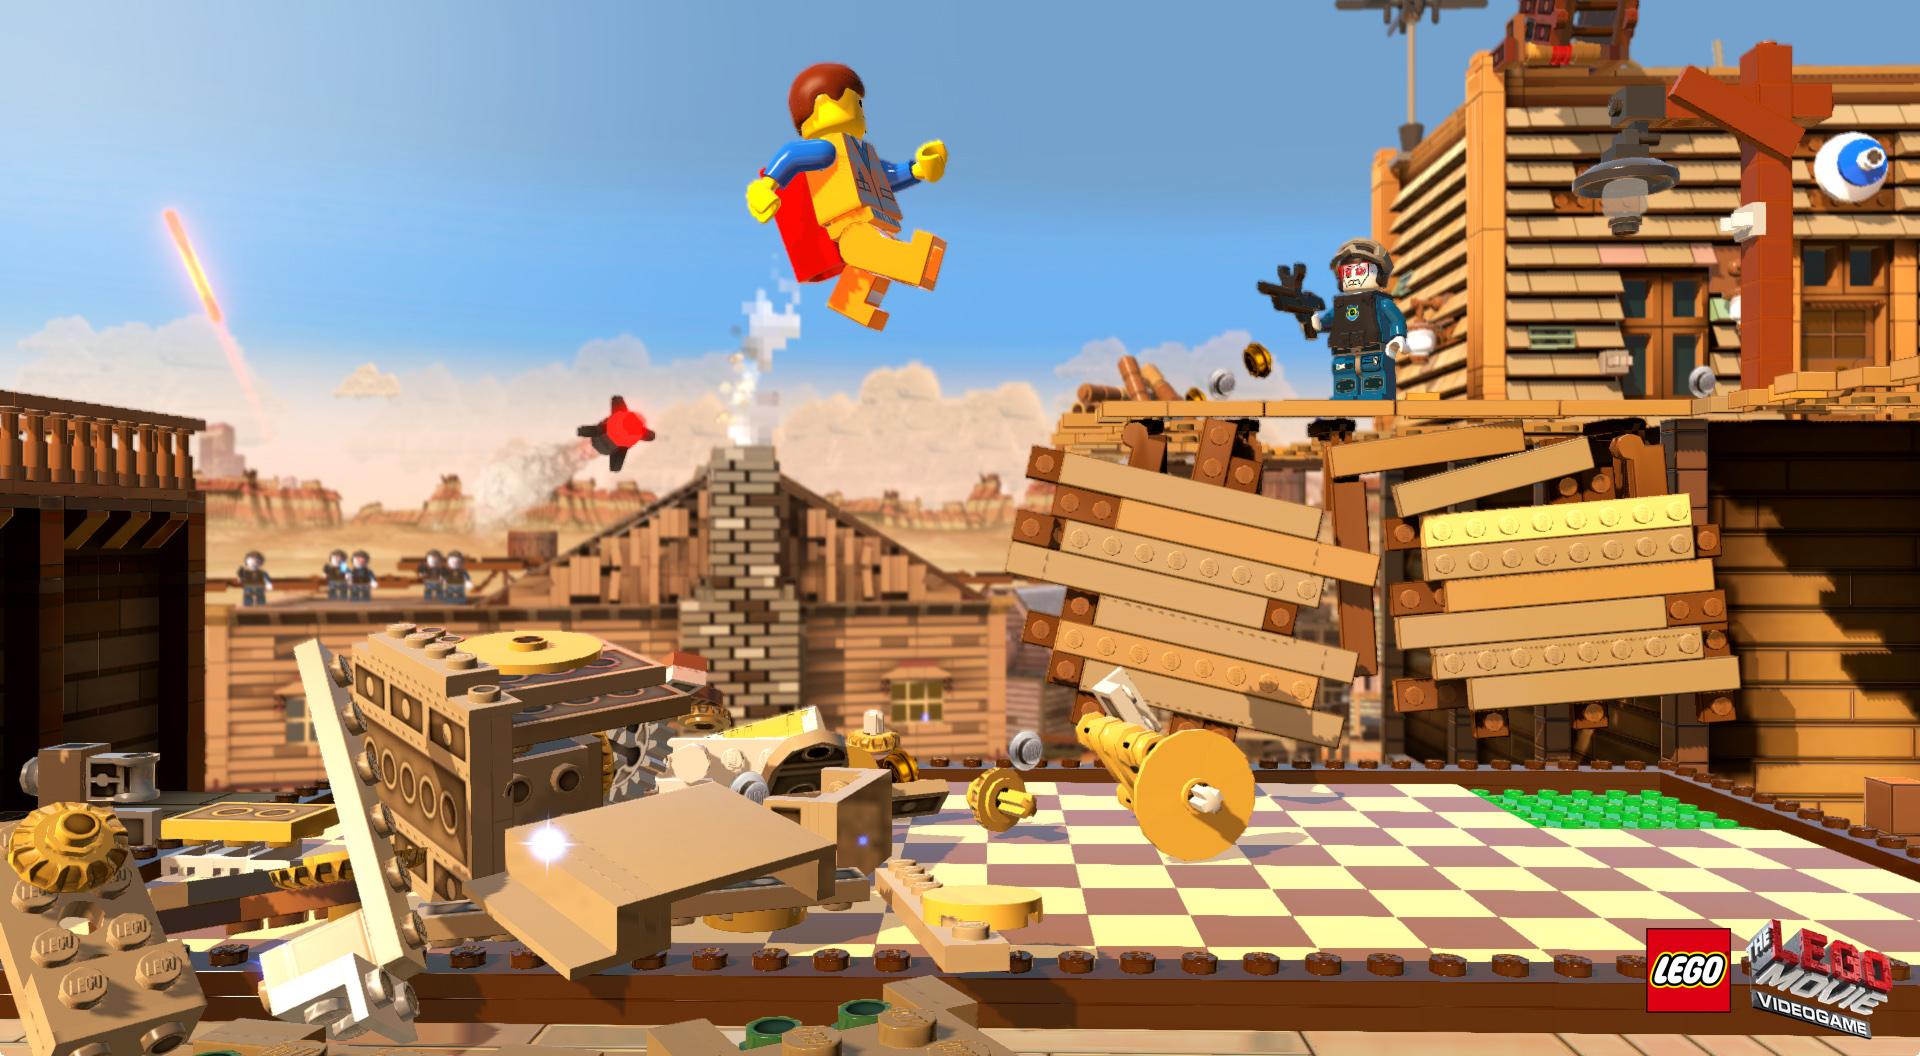 The LEGO Movie Videogame Tlm_bricksburg30